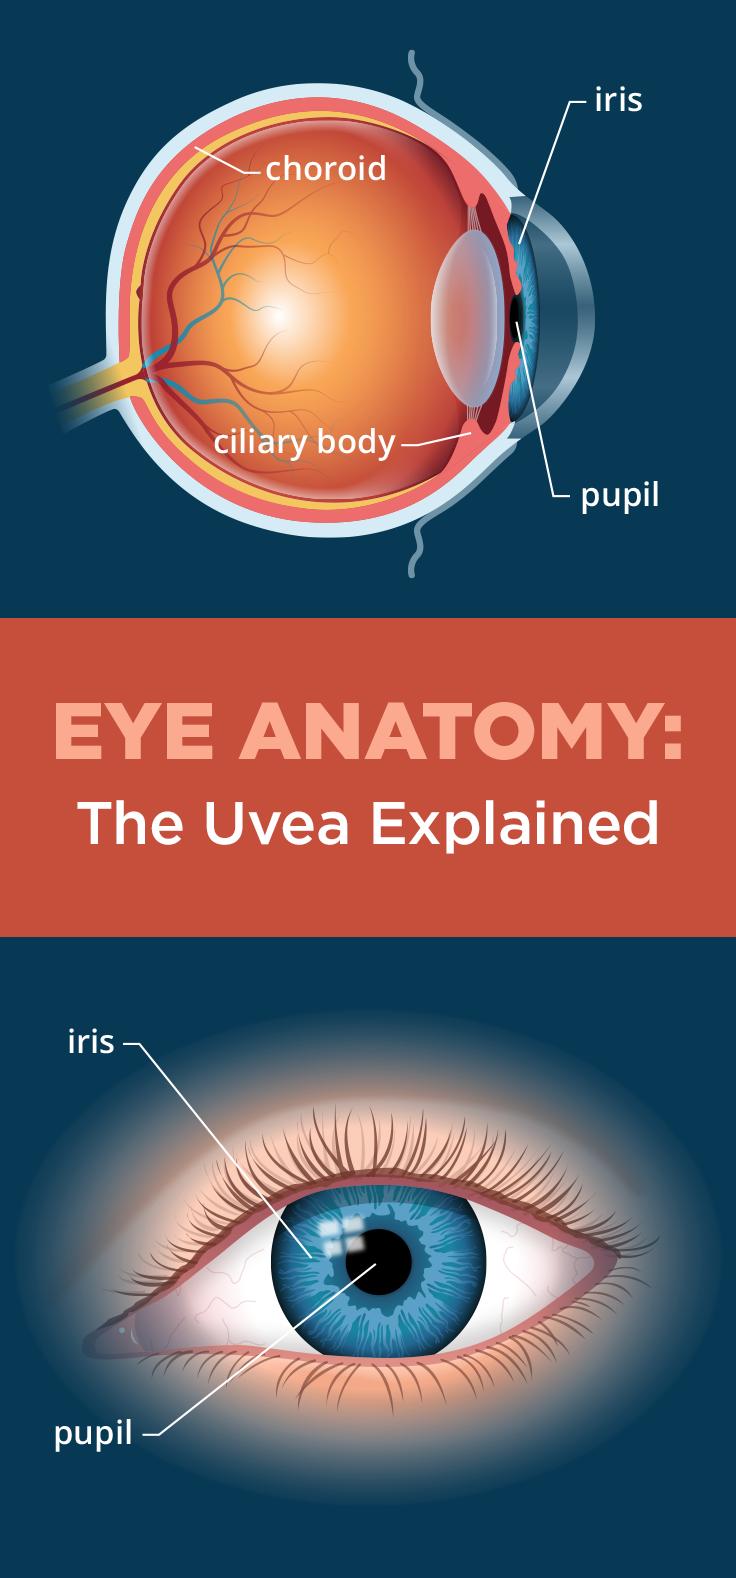 Iris and Uvea of the Eye - AllAboutVision.com | Classroom Ideas ...